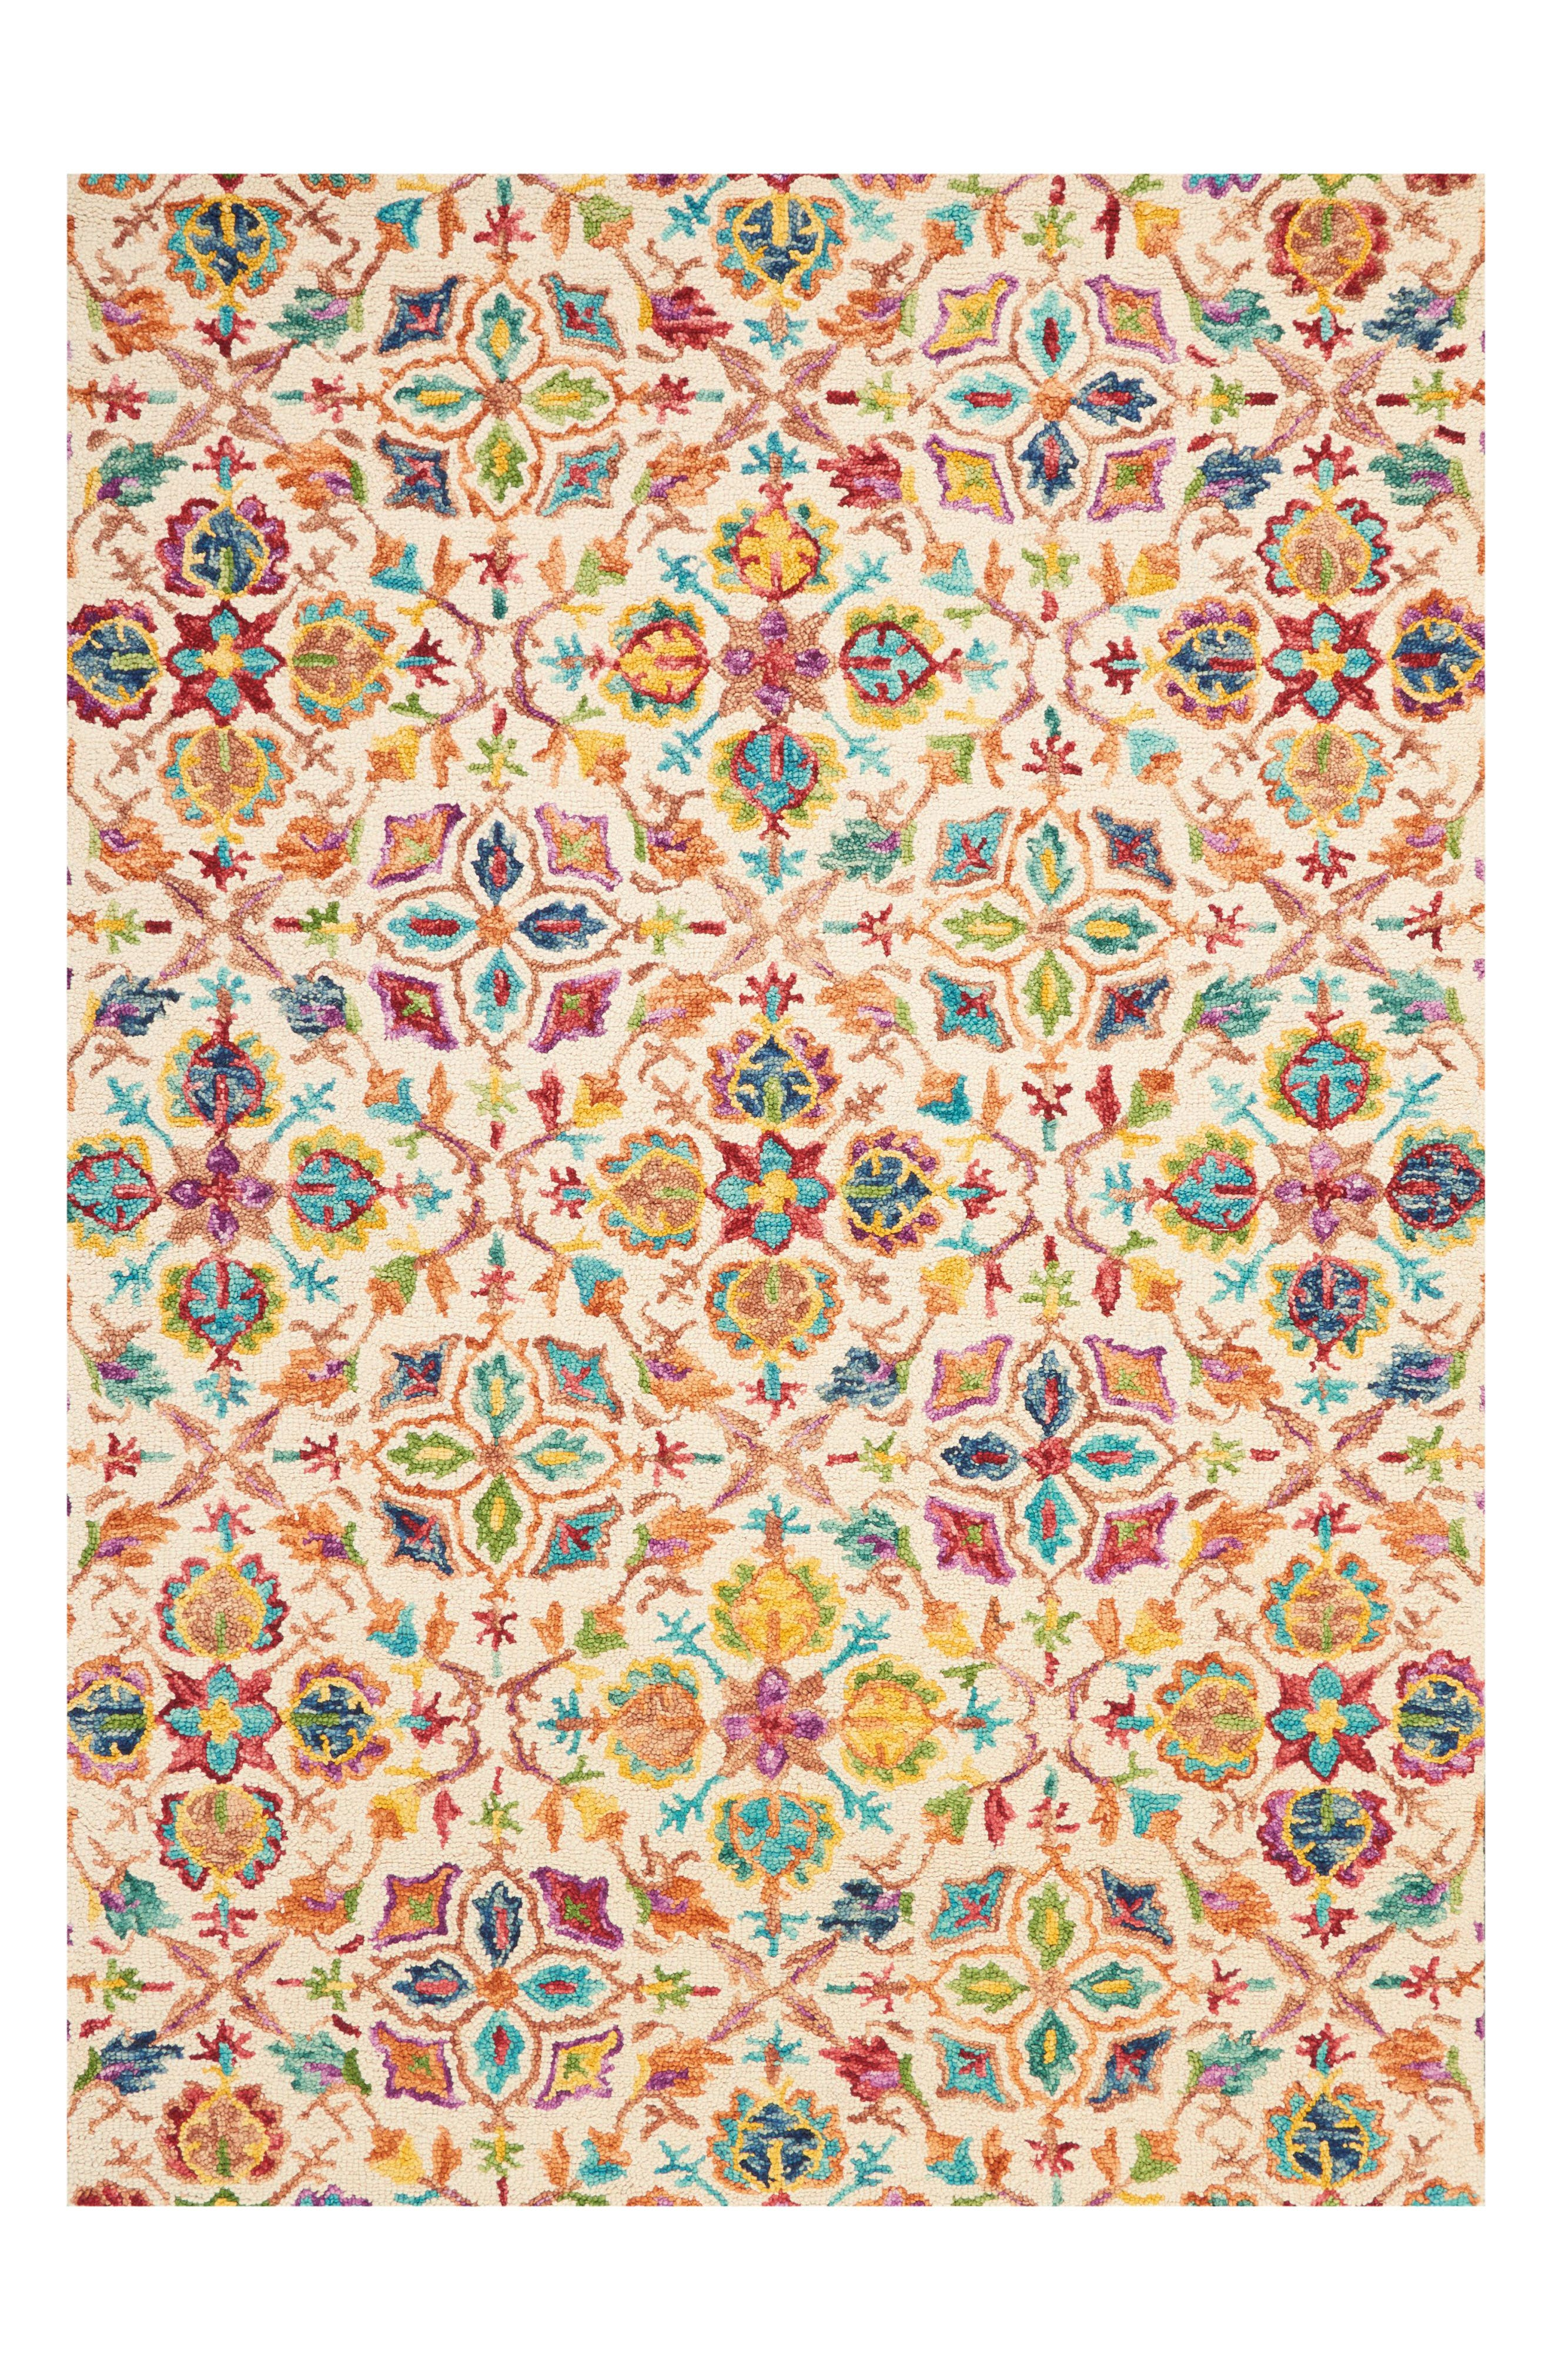 Vivid Wool Rug,                         Main,                         color, Ivory